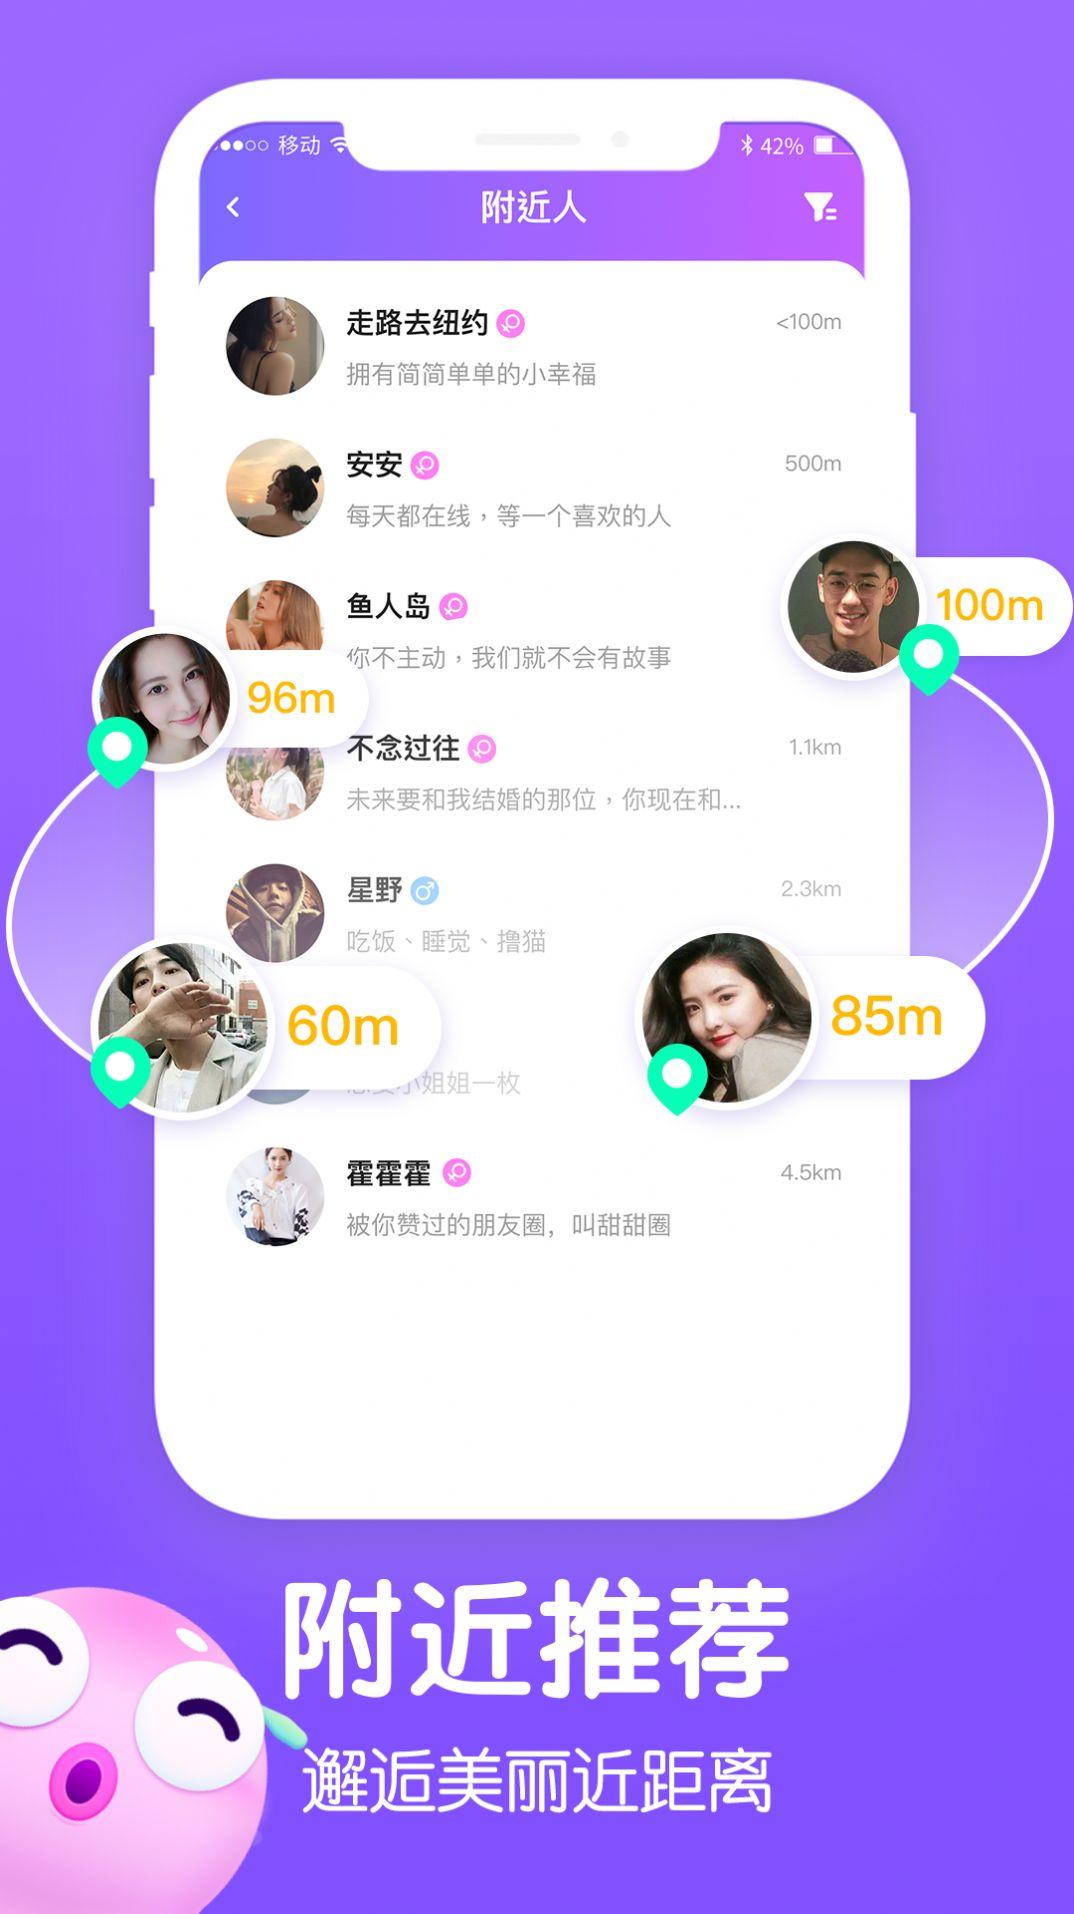 Biu语音app最新版图2: